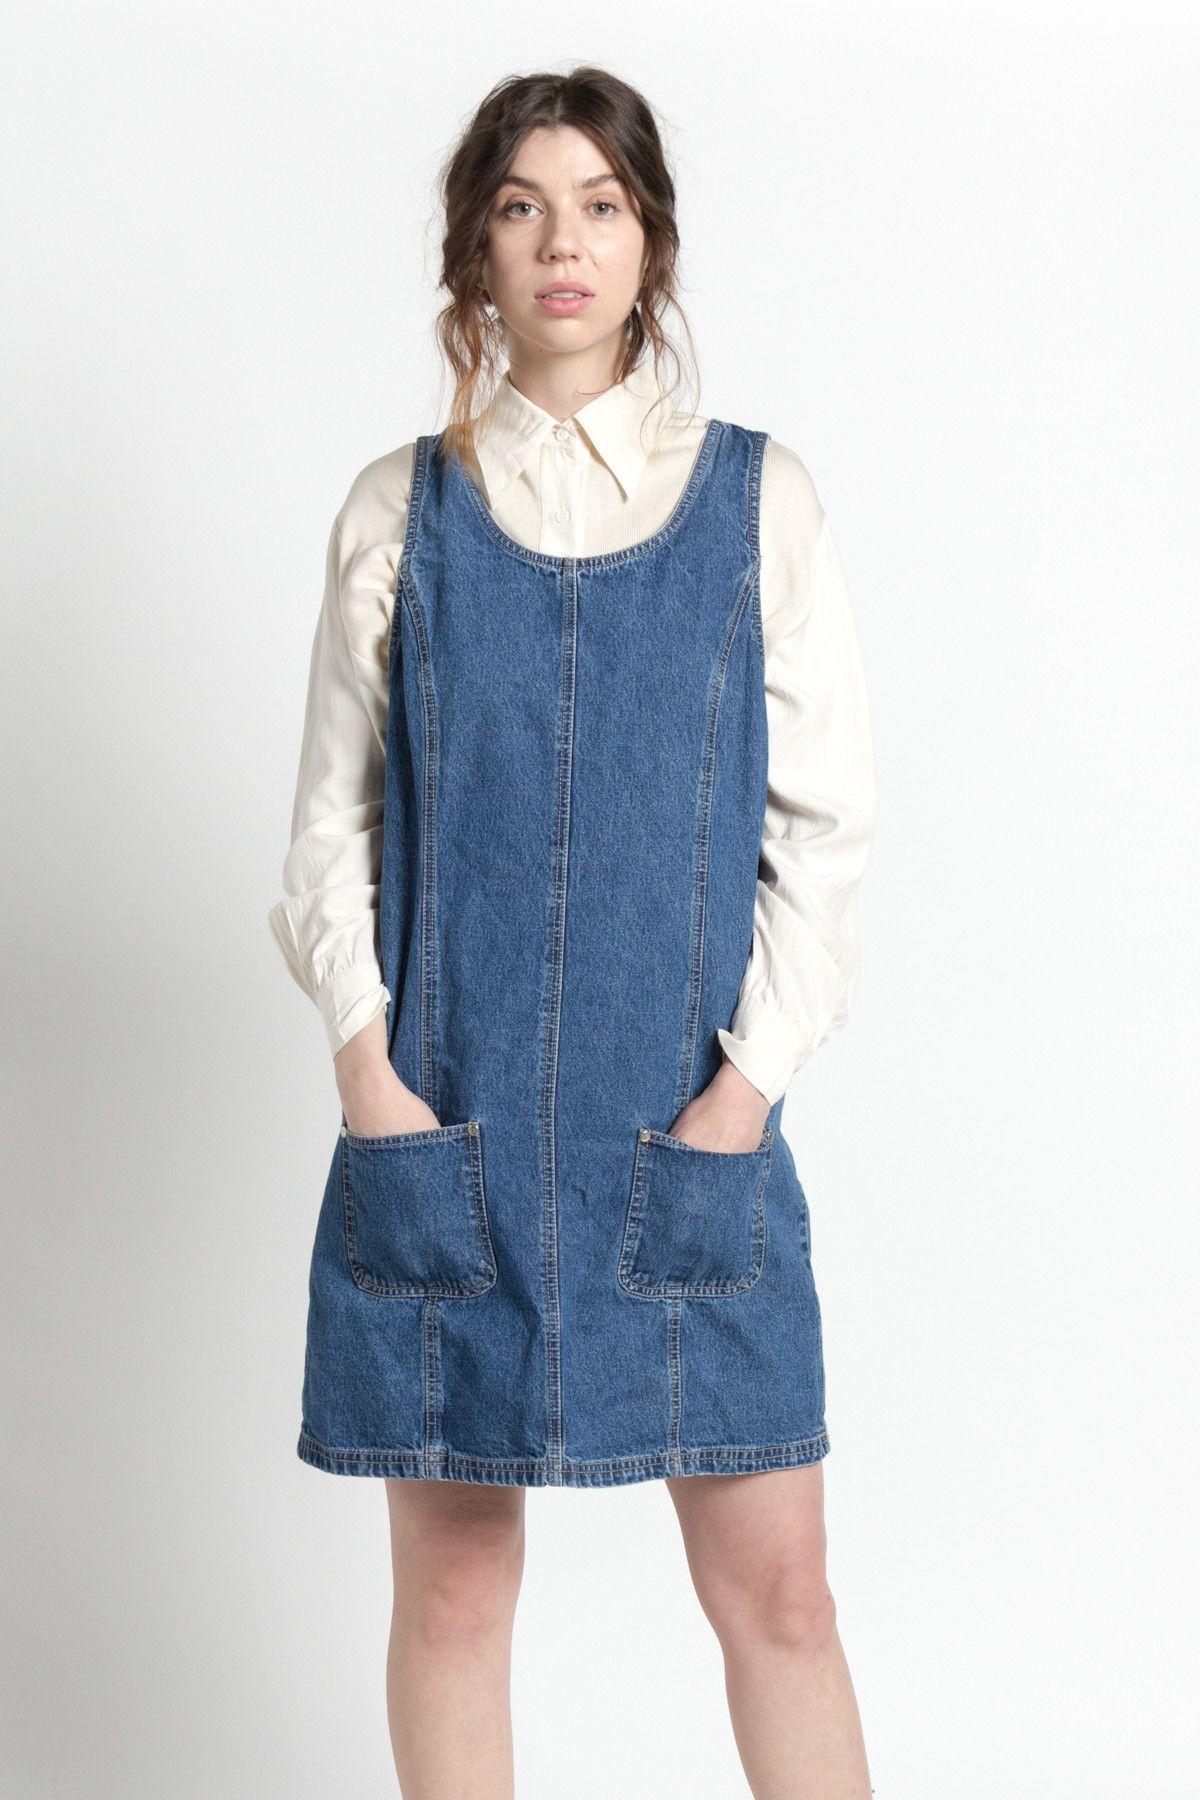 6e7da225d2a Vintage 90s Blue Cotton Denim Jumper Dress with Pockets